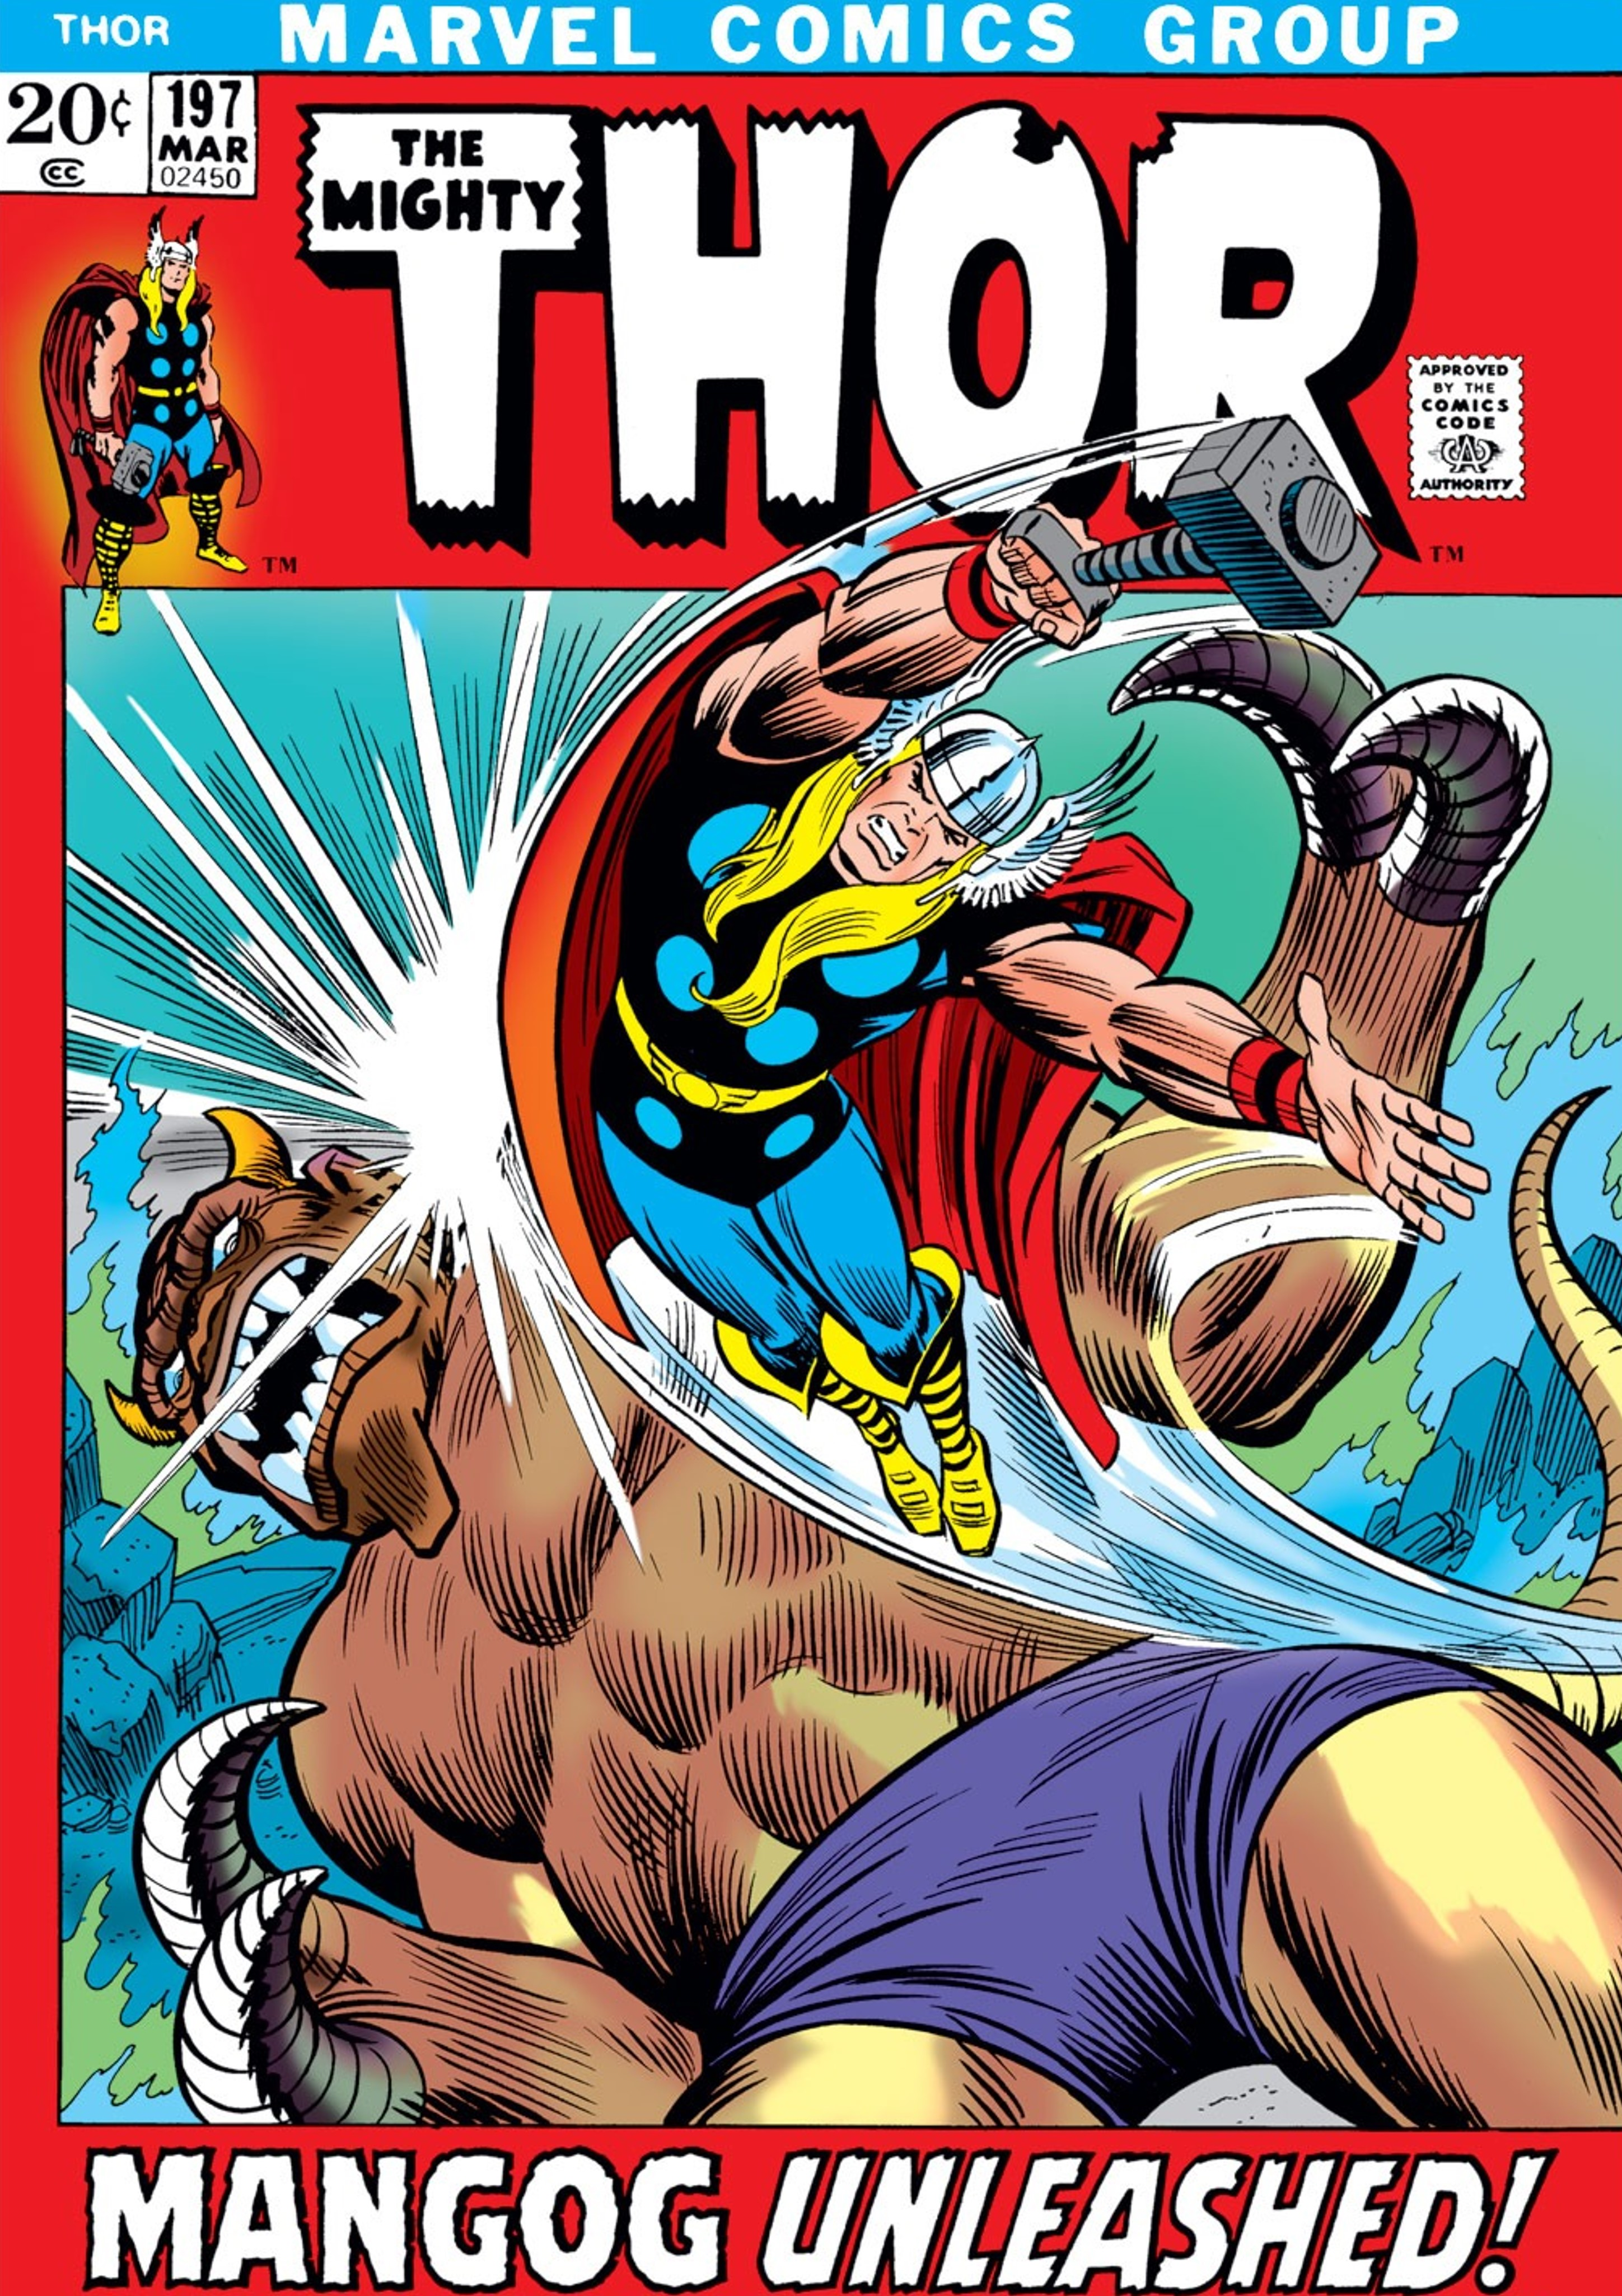 Thor Vol 1 197.jpg